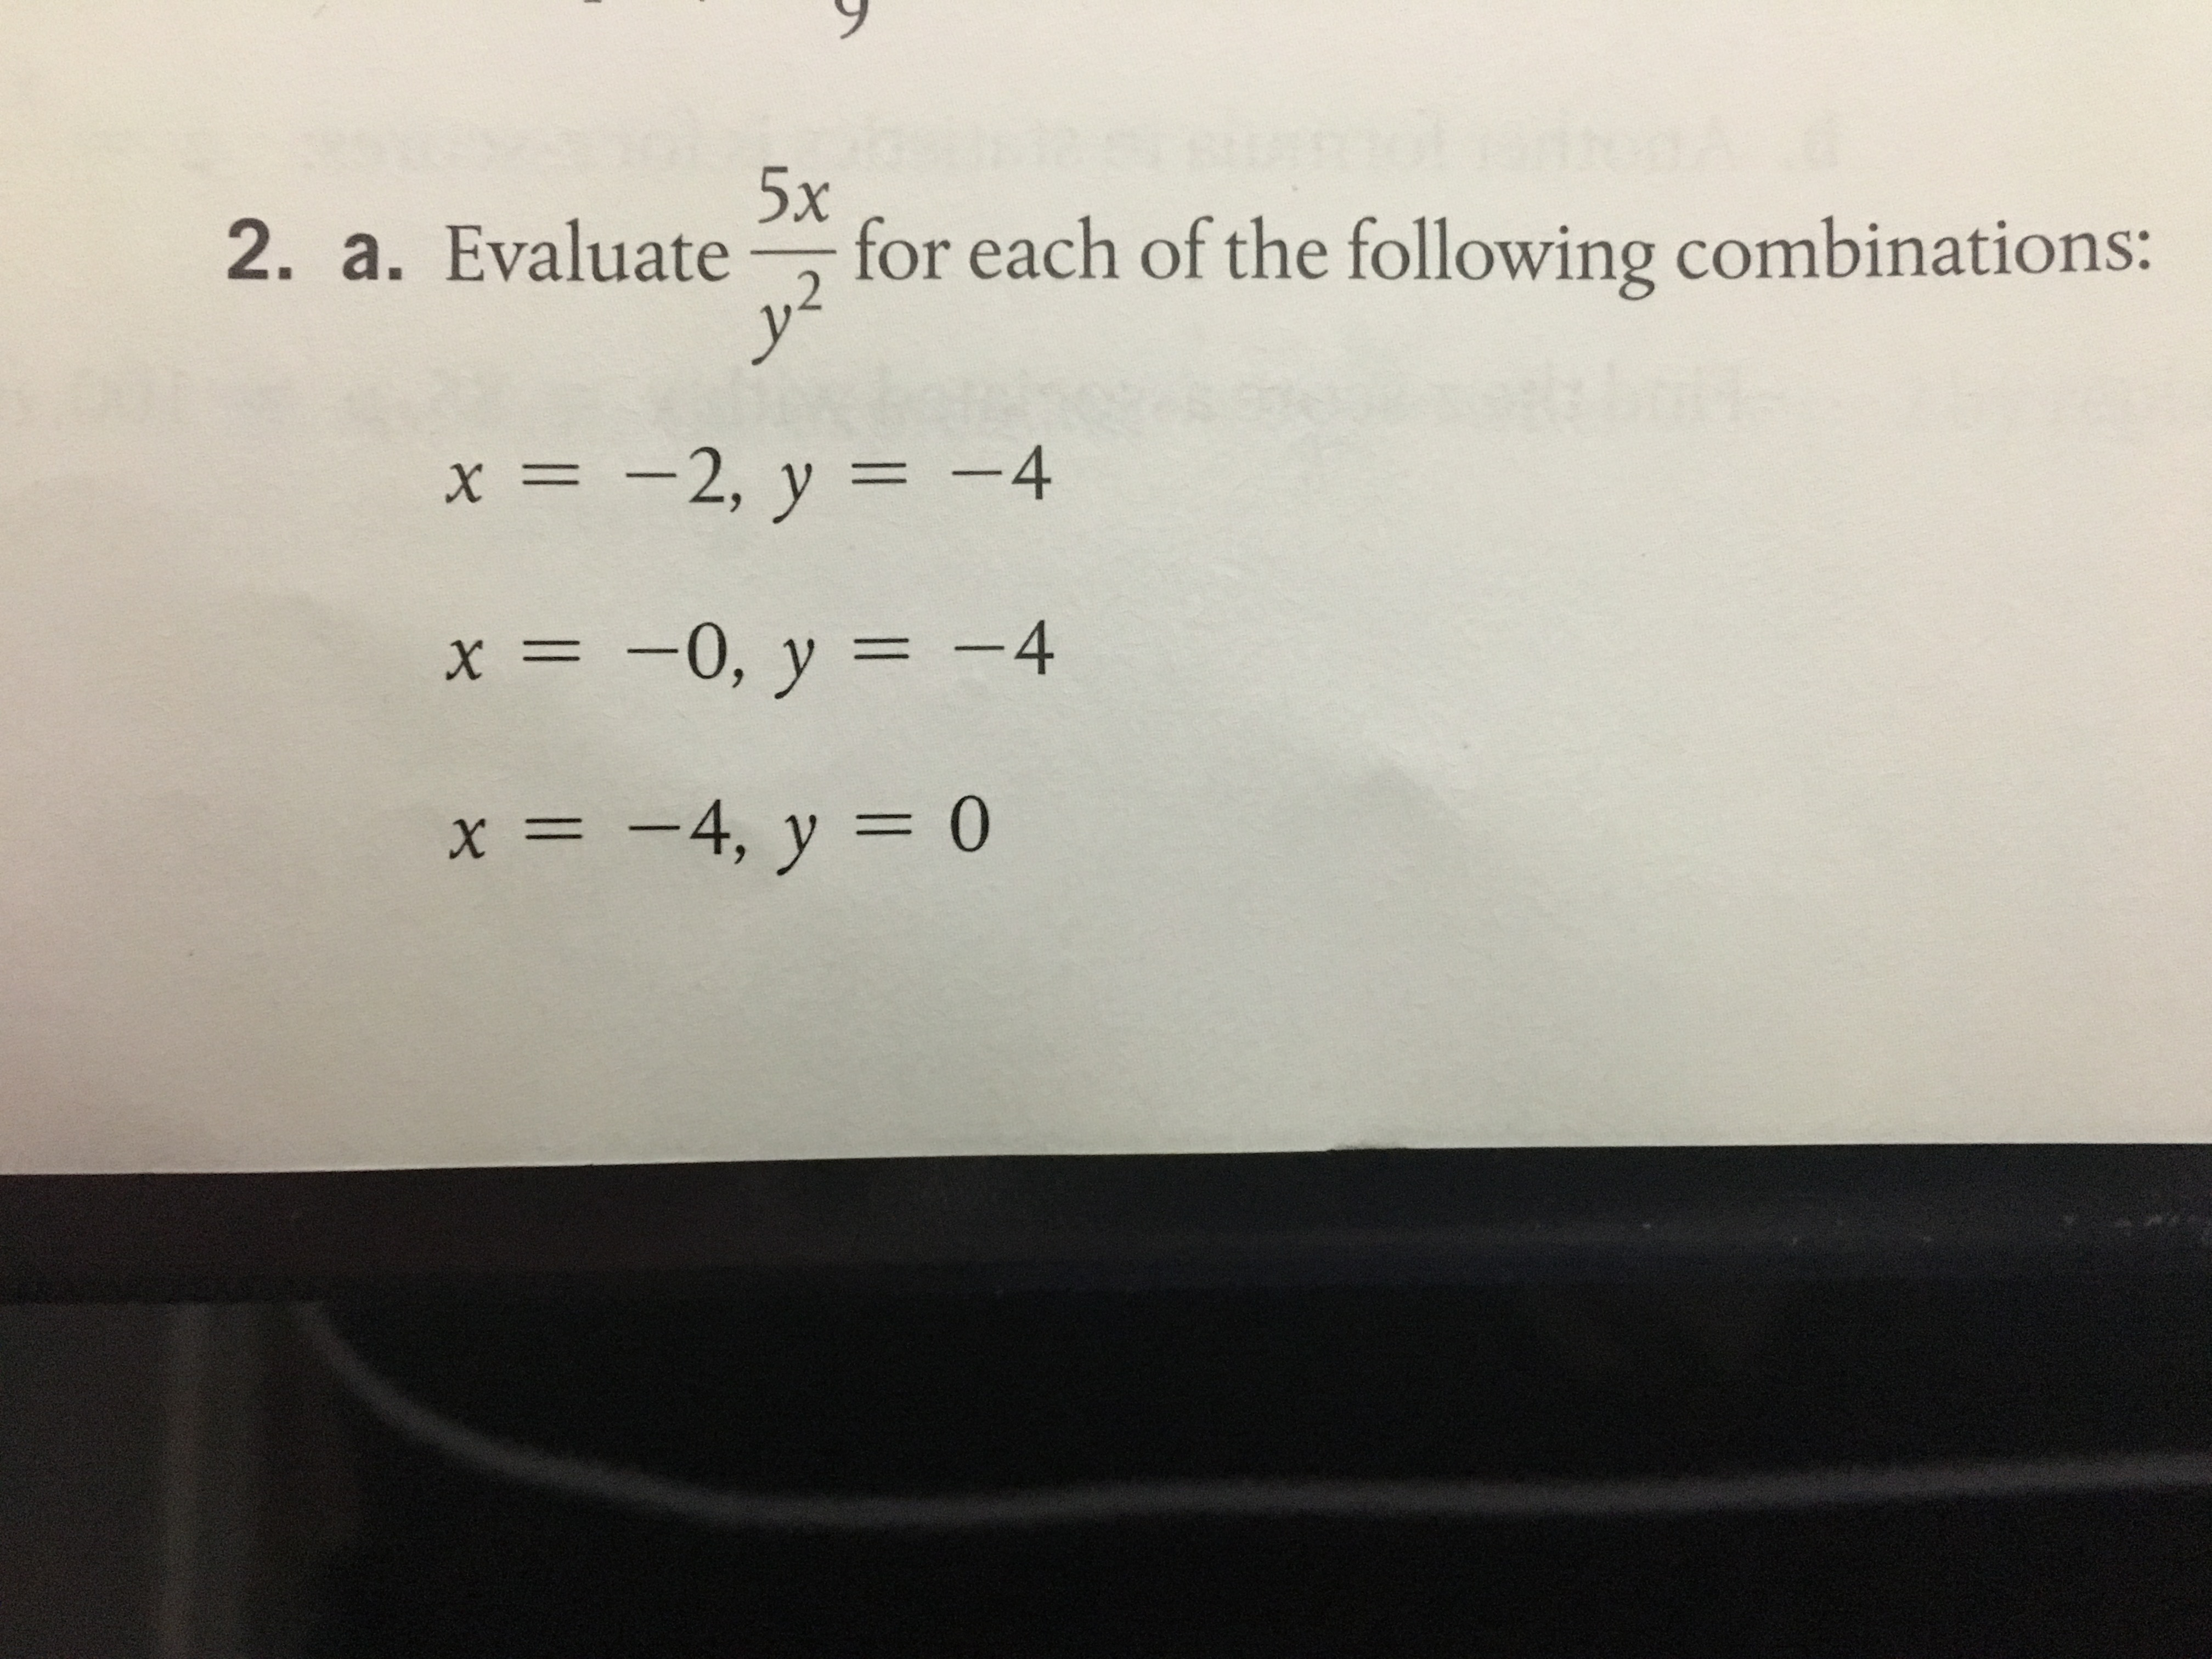 2. a. Evaluate for each of the following combinations: y2 x=-2, y =-4 x=-0, y =-4 x=-4, y = 0